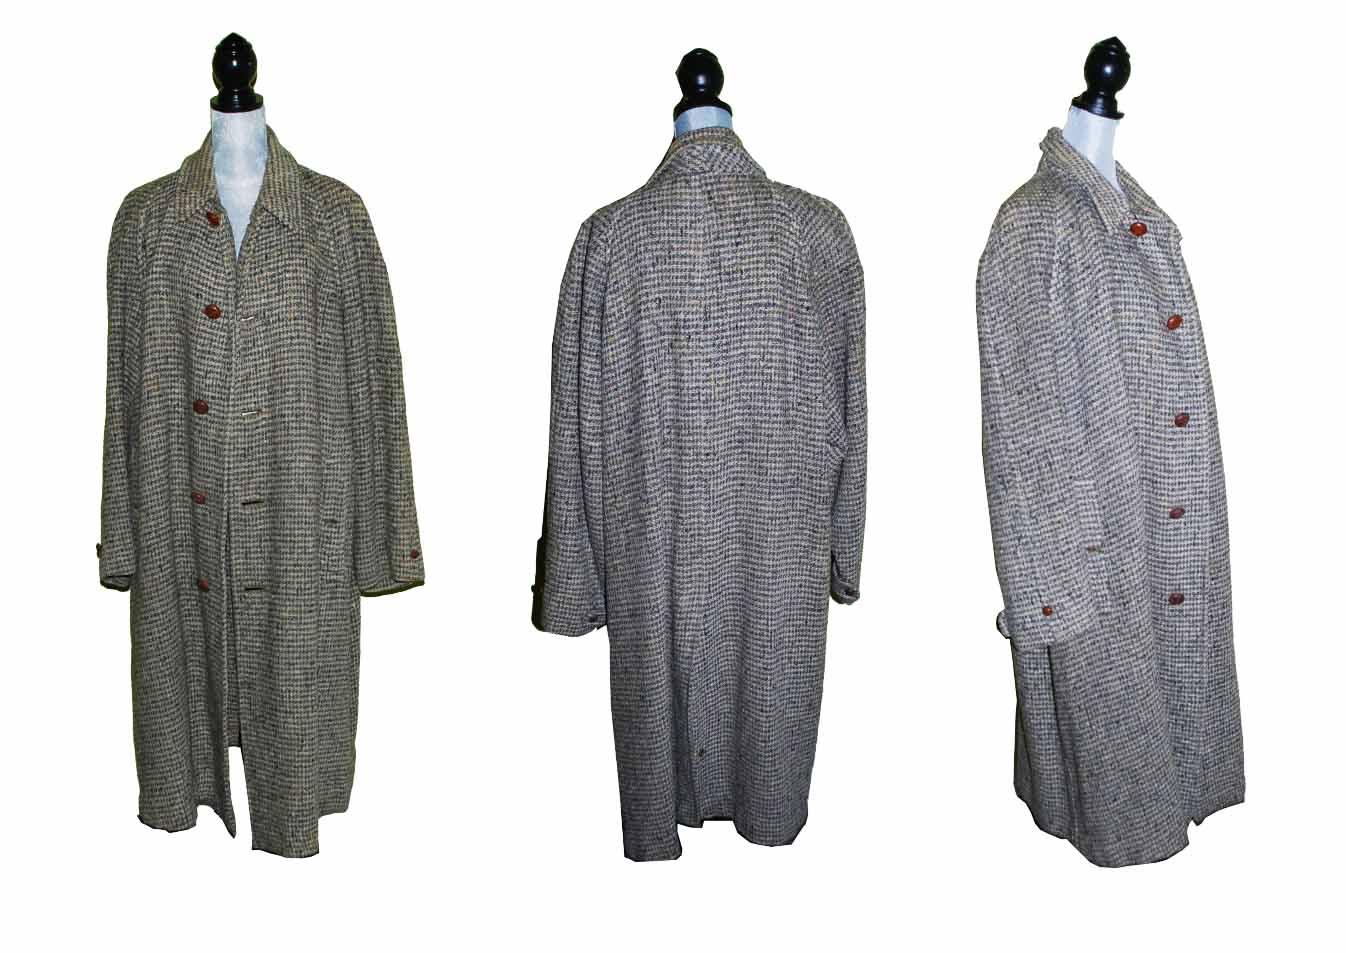 The burbery coat